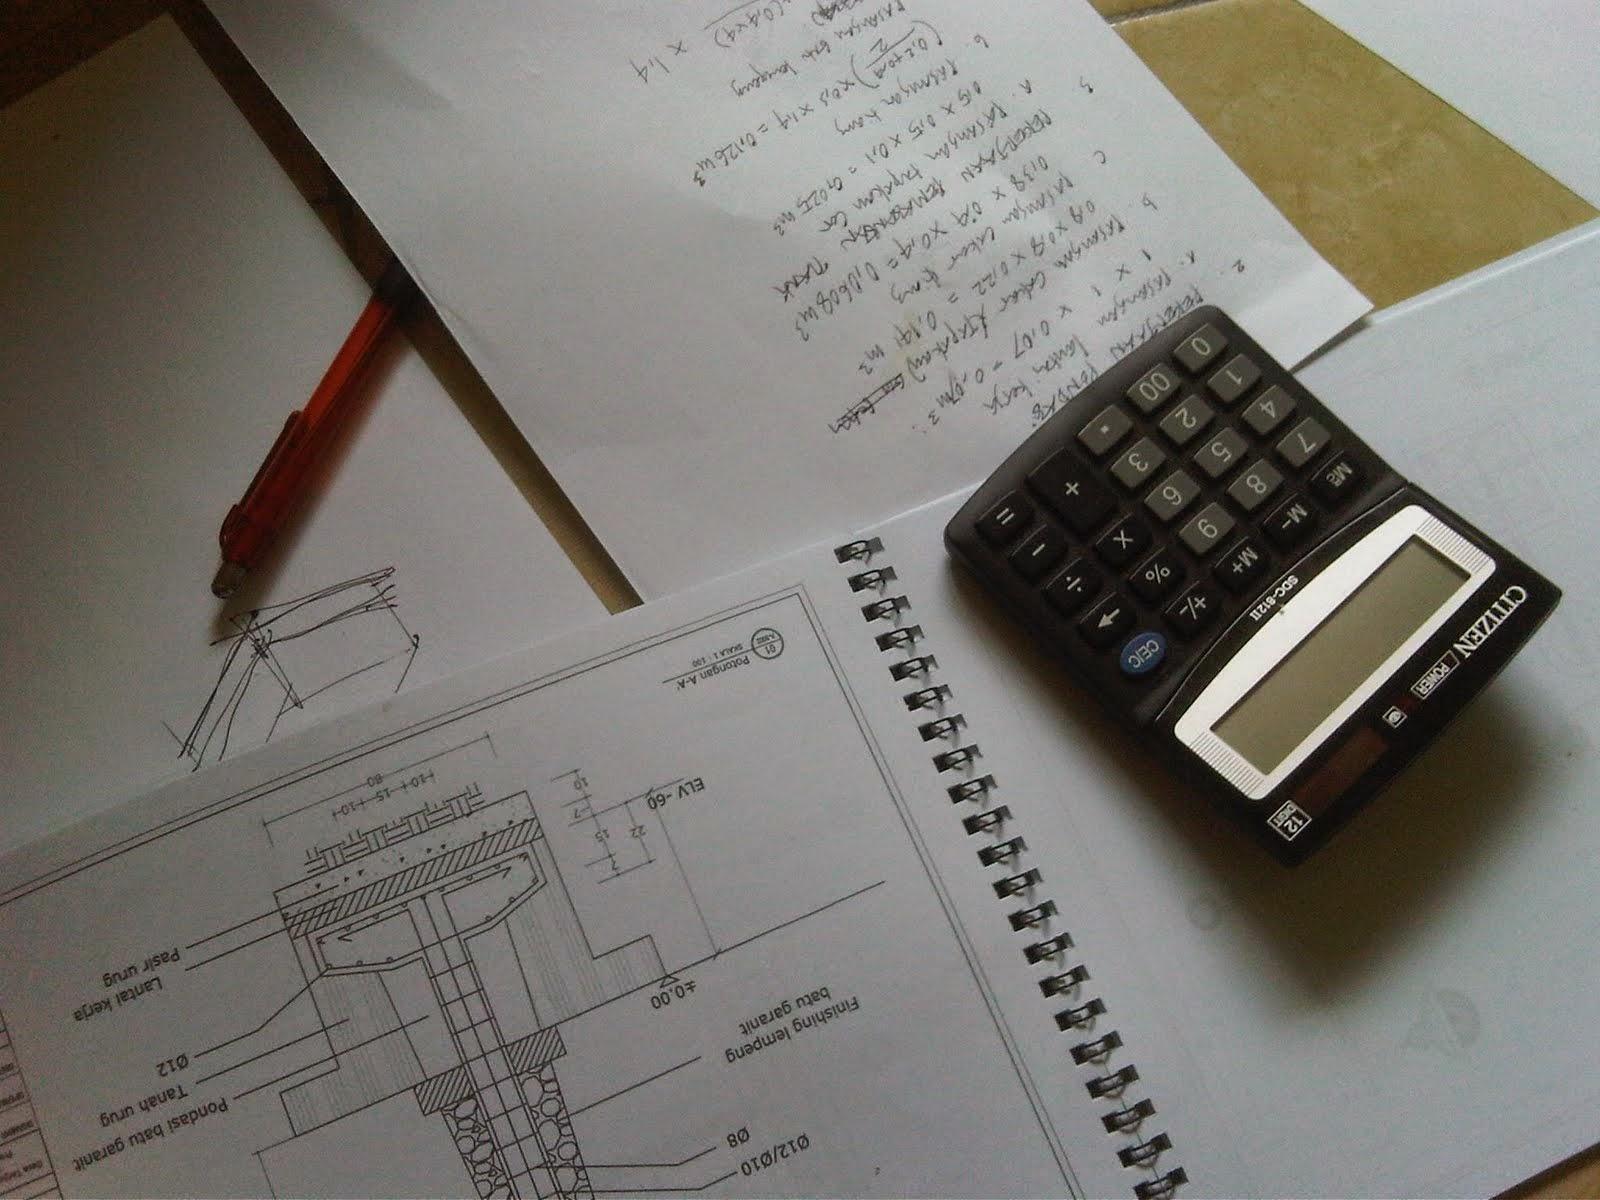 Jasa Arsitek | Jasa Hitung Struktur | Jasa Hitung RAB